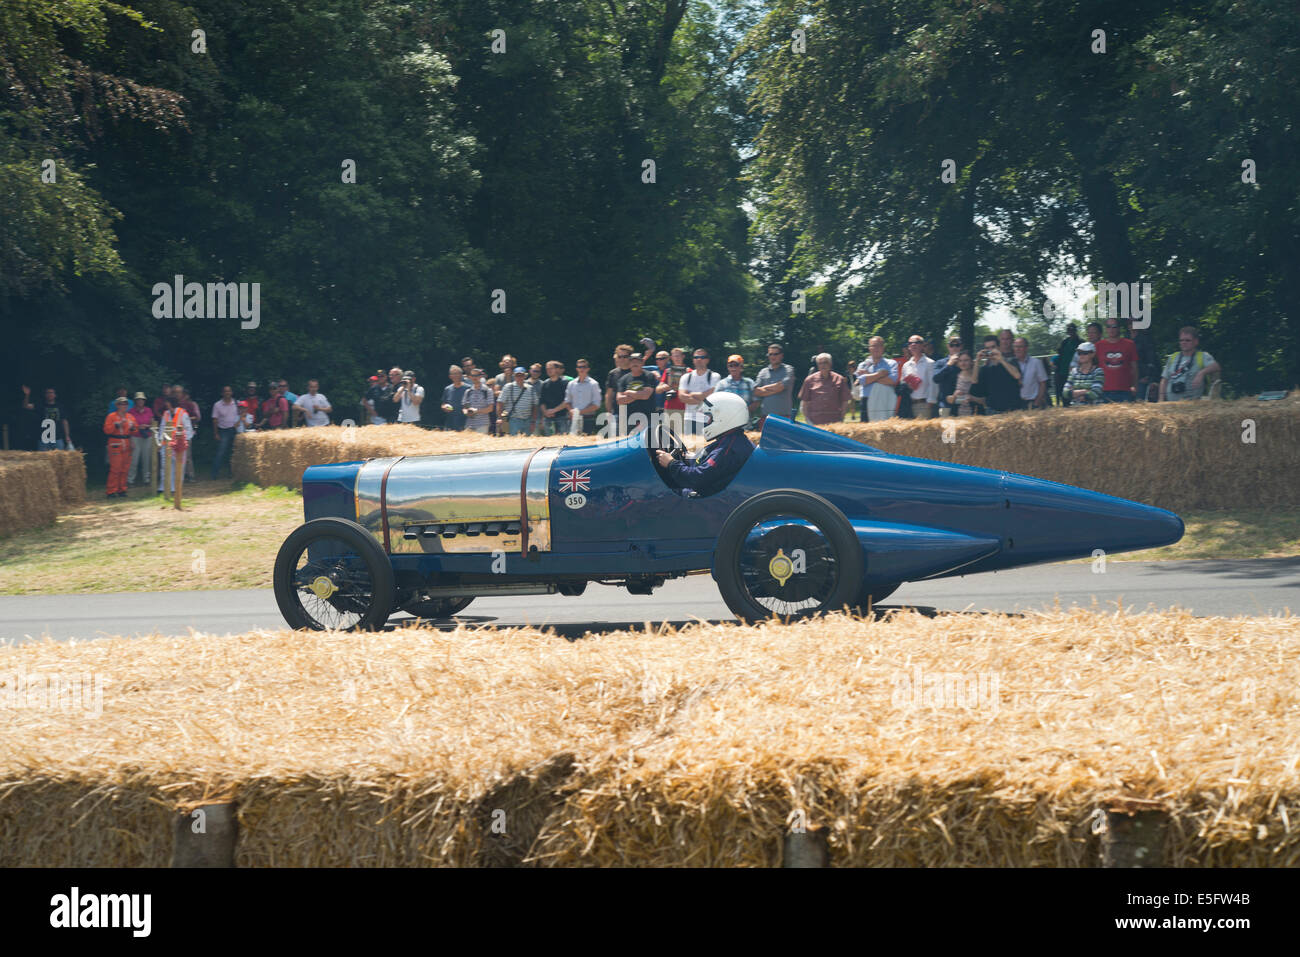 Auto absteigend Goodwood Bergrennen beim Goodwood Festival of Speed Stockbild